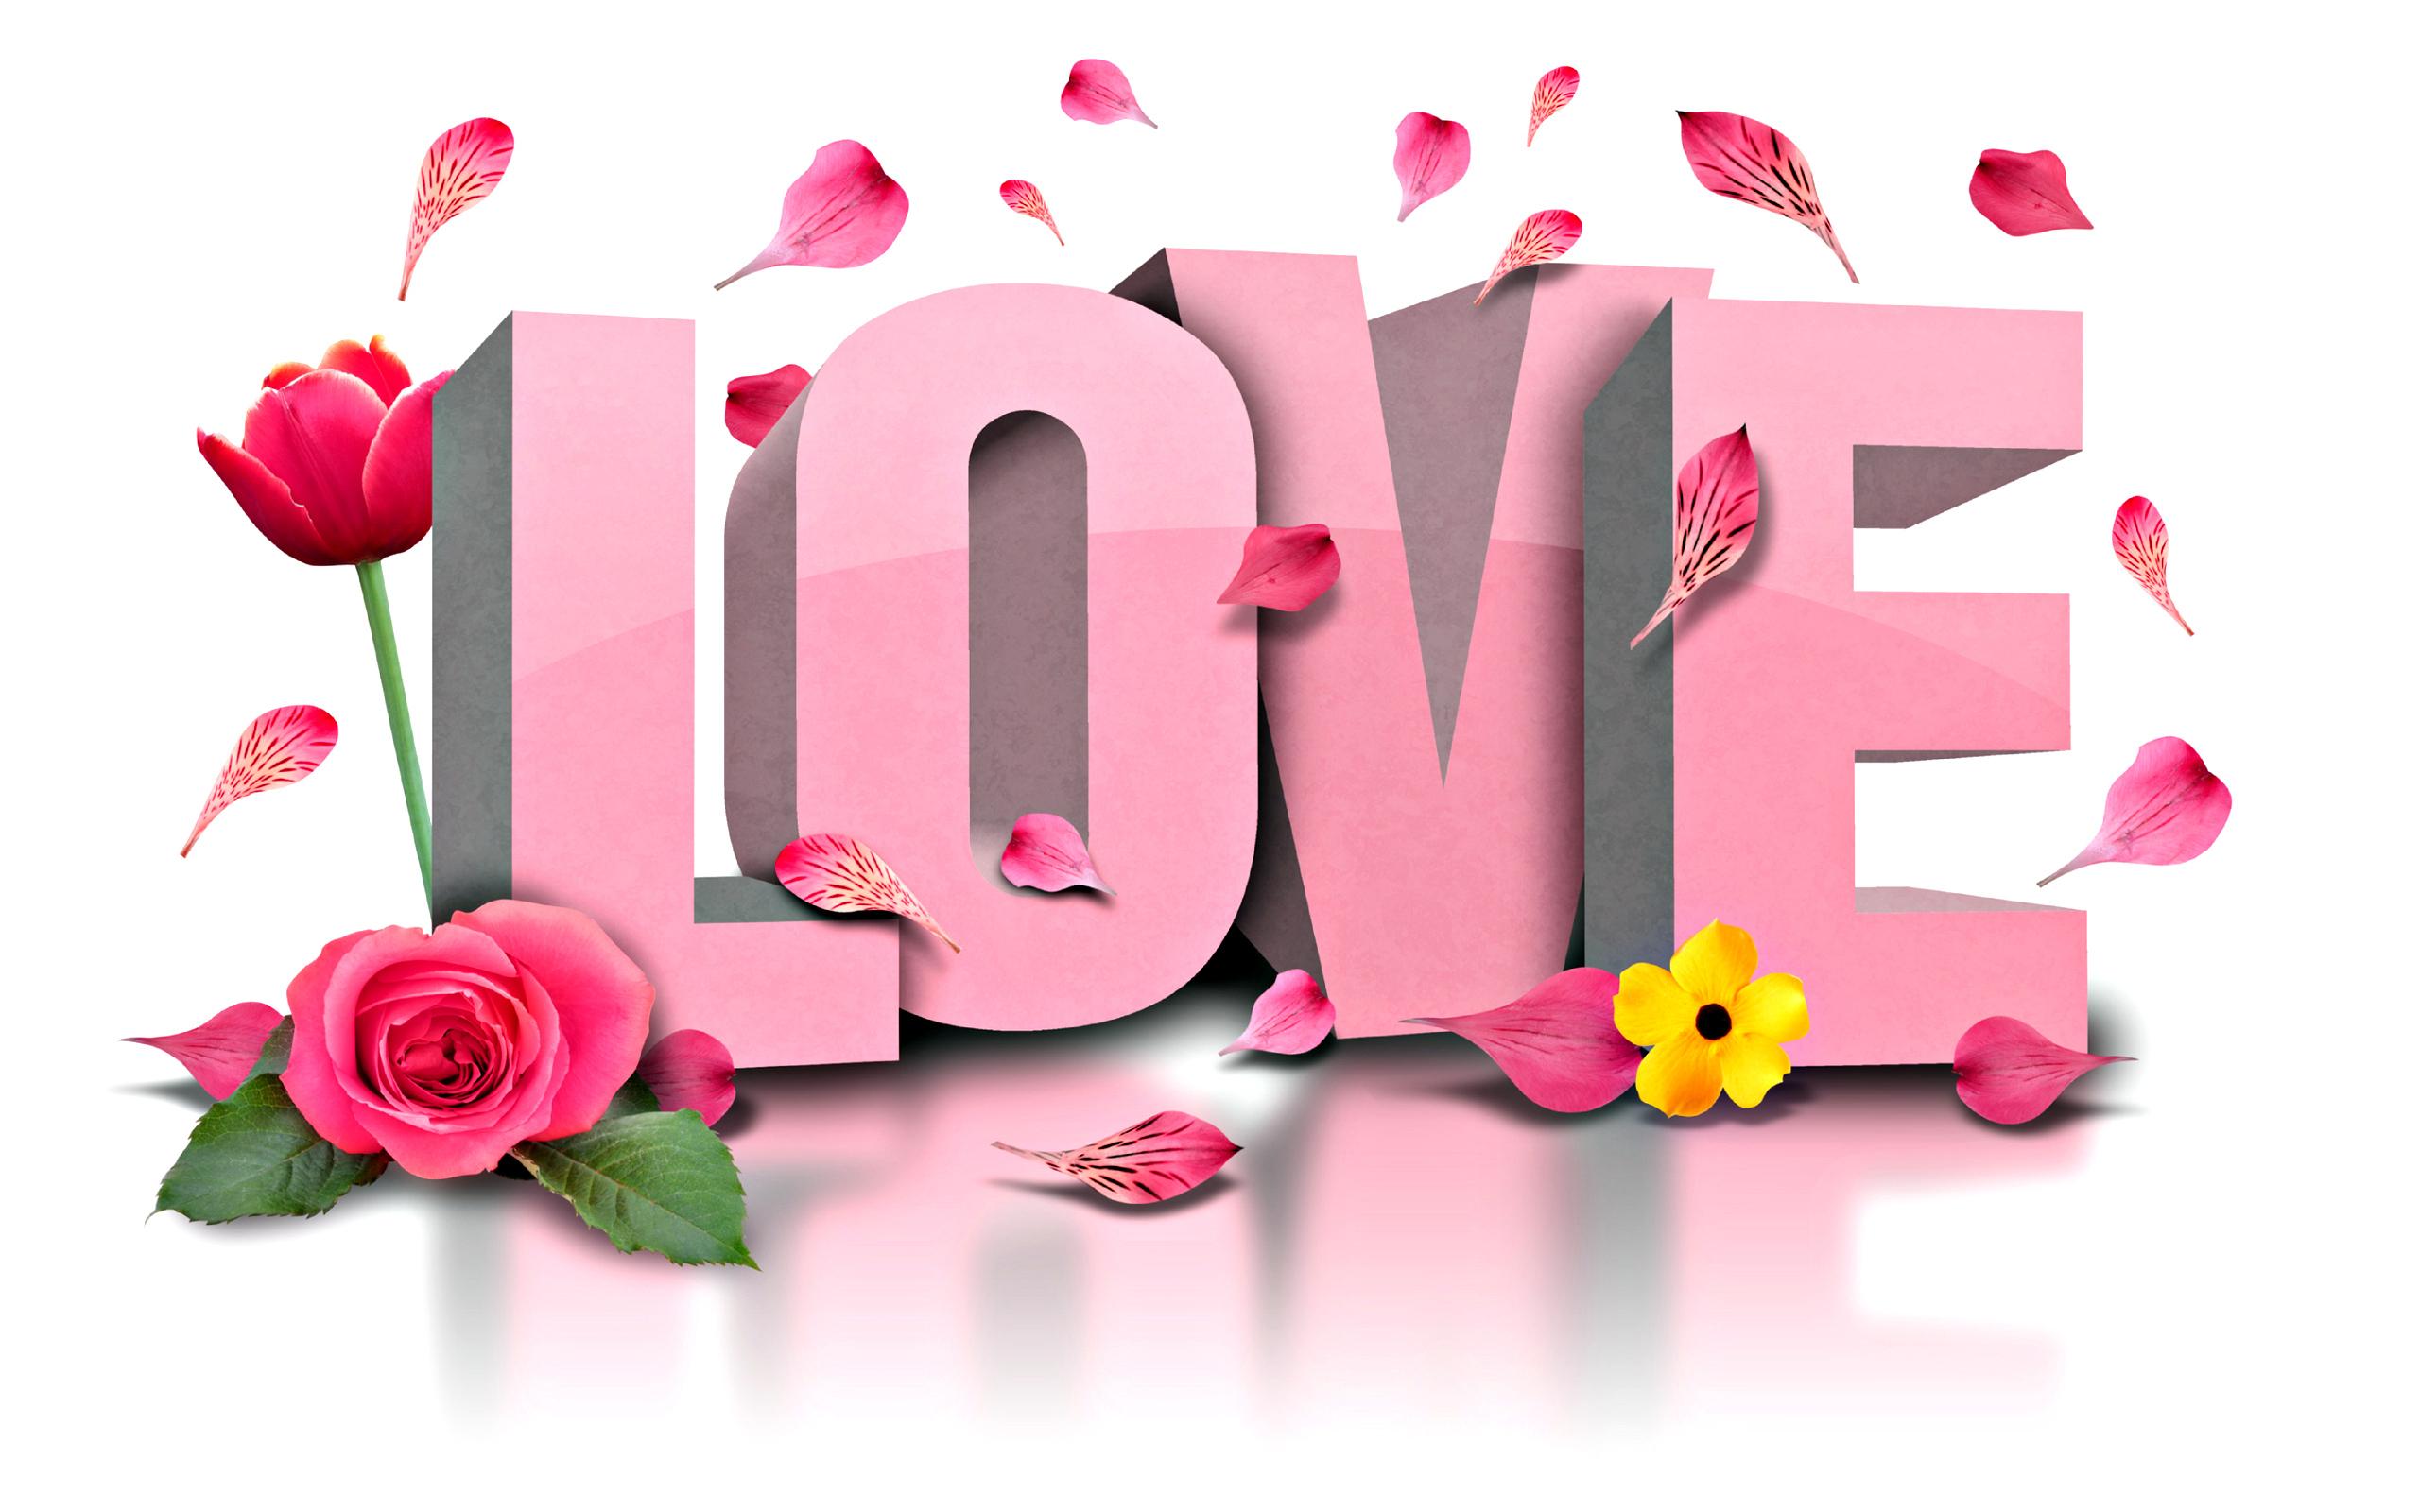 Love flower pictures savingourboysfo love flower hd wallpapers pulse beautiful flower izmirmasajfo